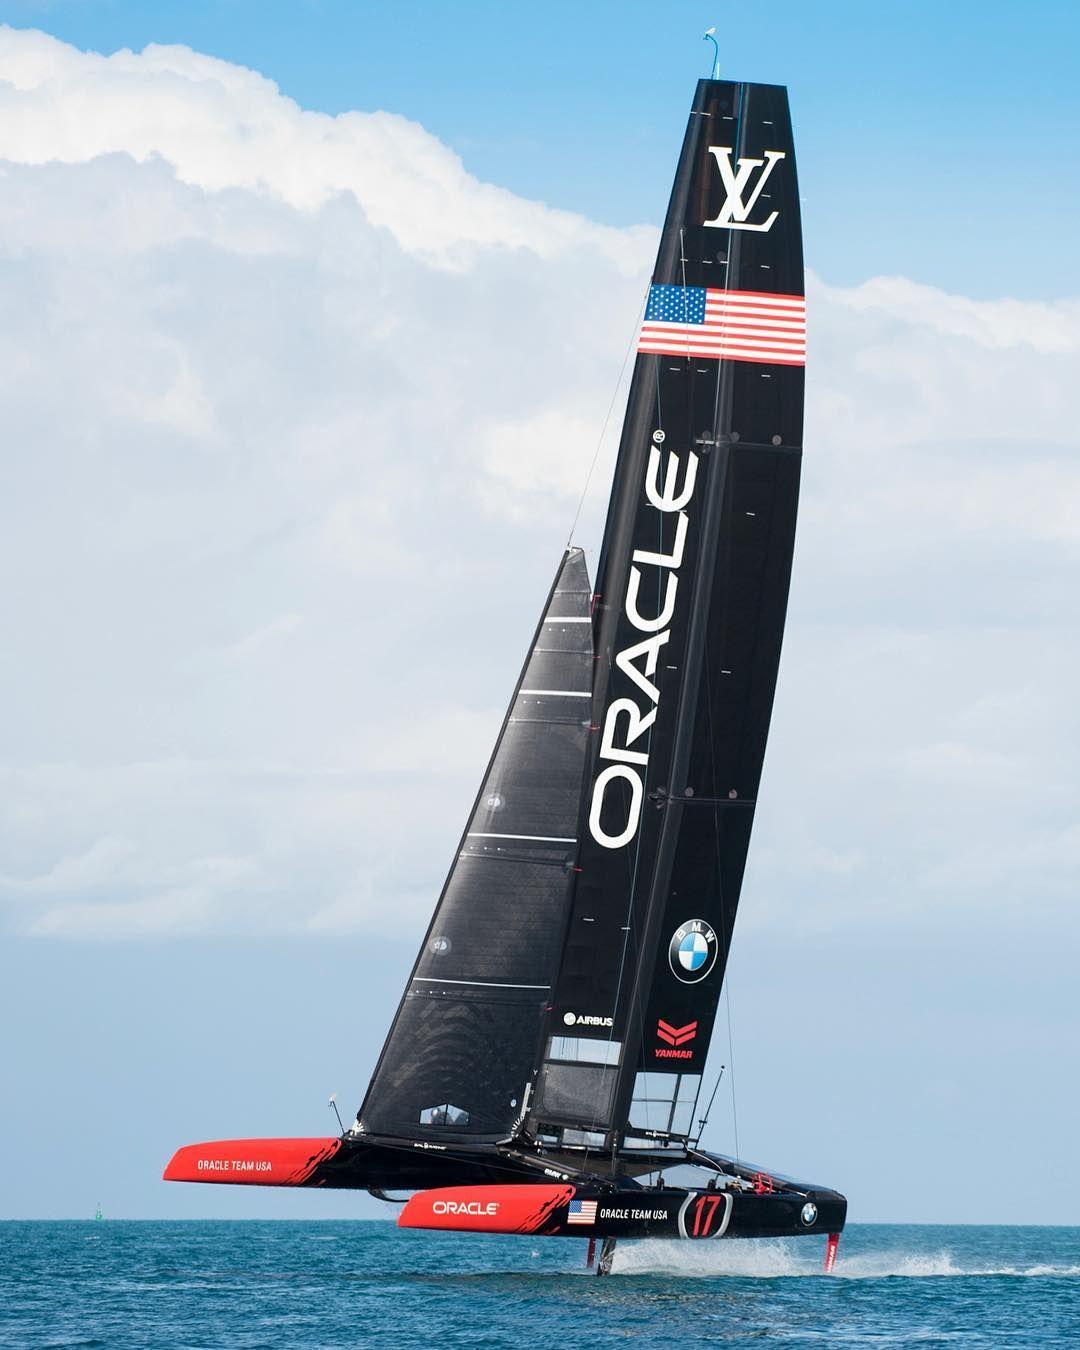 Pin By Bob Barraclough On Boats In 2020 Volvo Ocean Race Americas Cup Sailing Catamaran